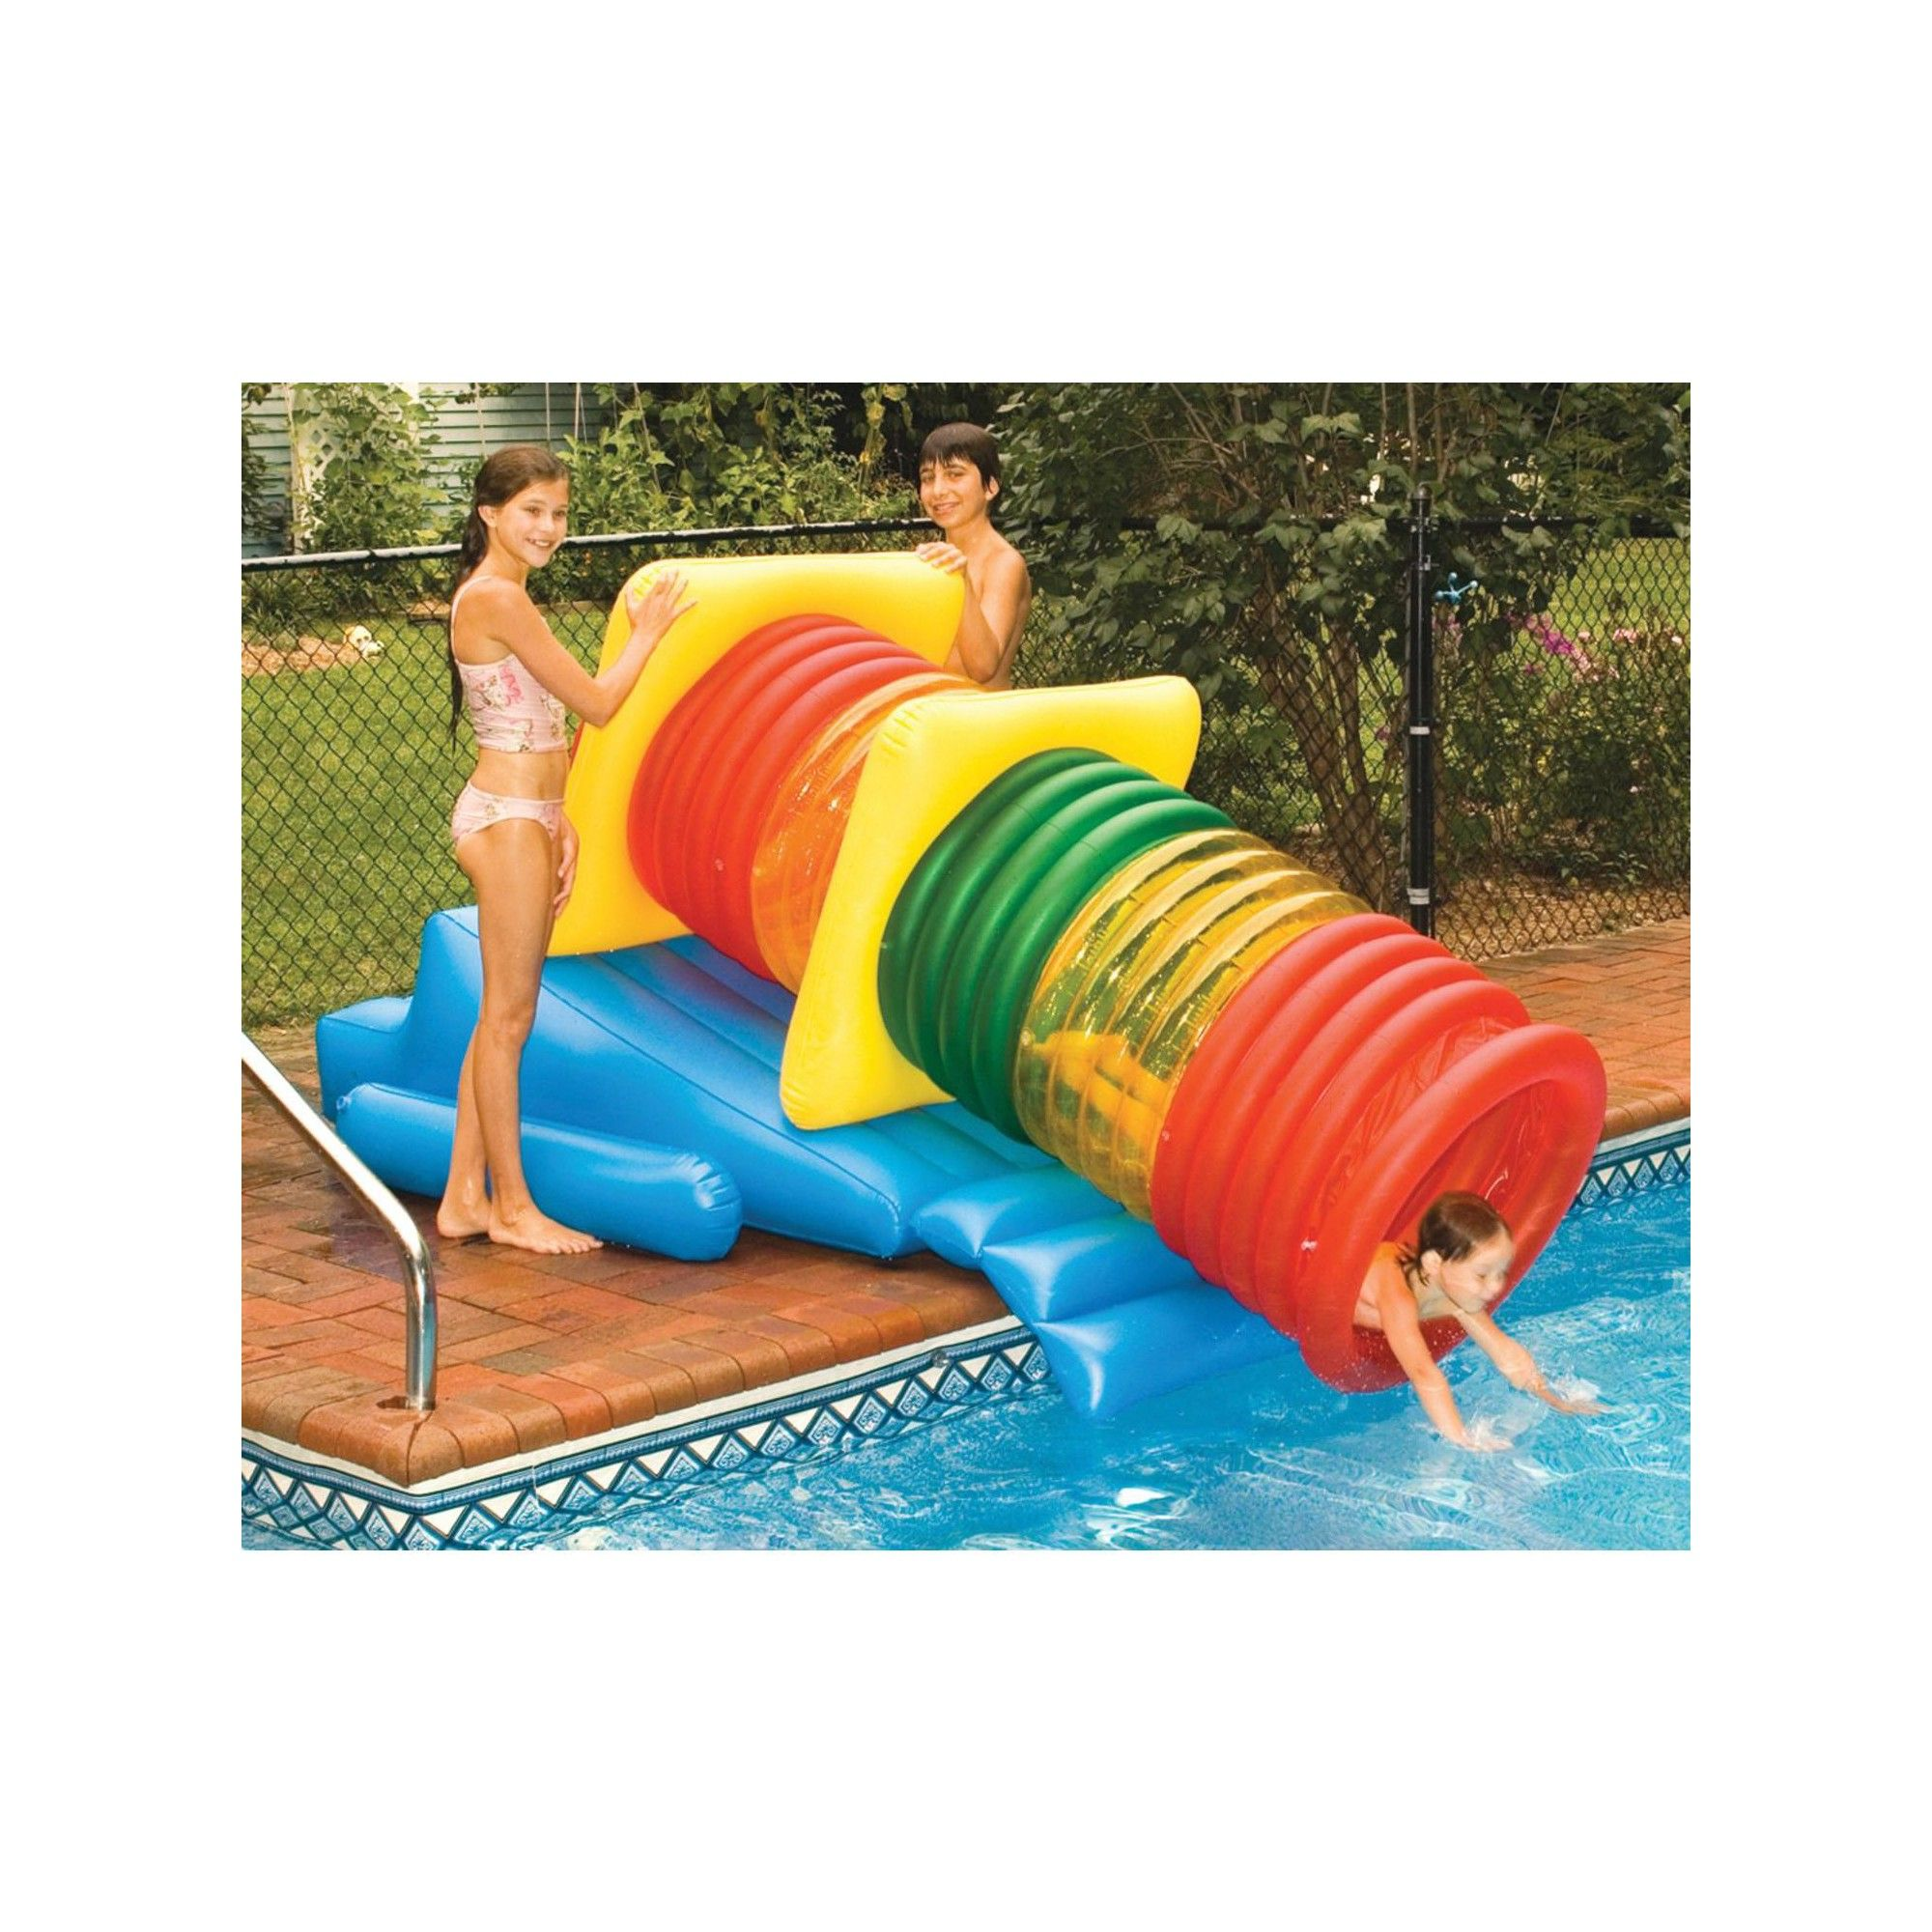 Swimline Water Park Inflatable Pool Slide